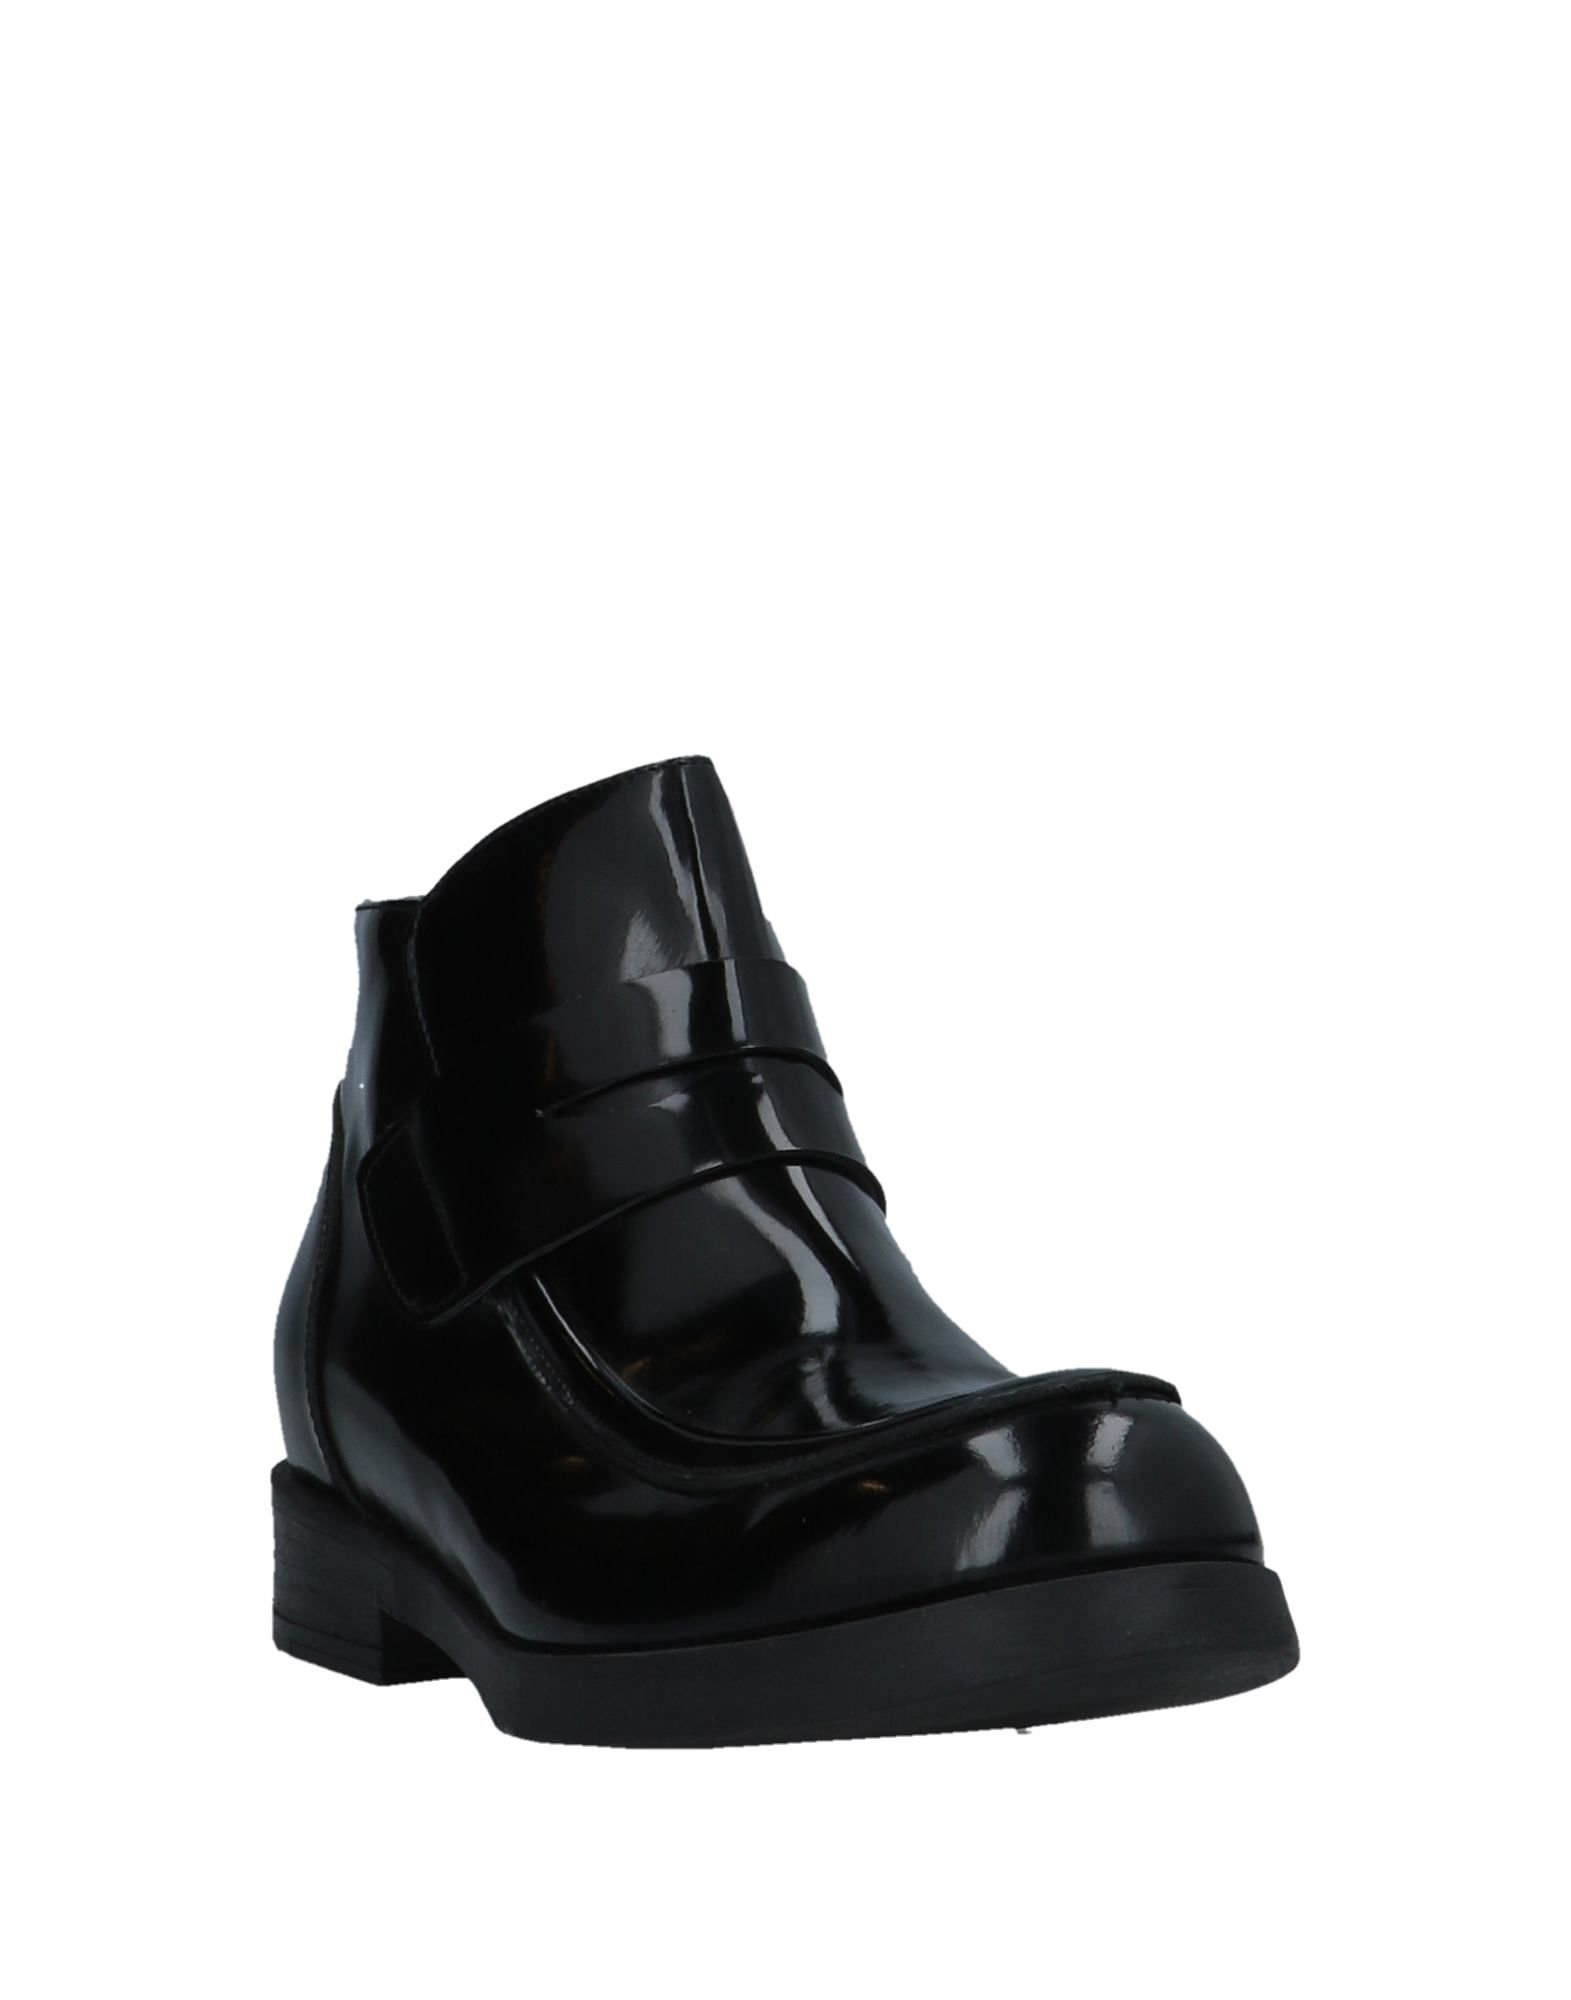 Paolina Perez Stiefelette Qualität Damen  11538222GD Gute Qualität Stiefelette beliebte Schuhe abe316